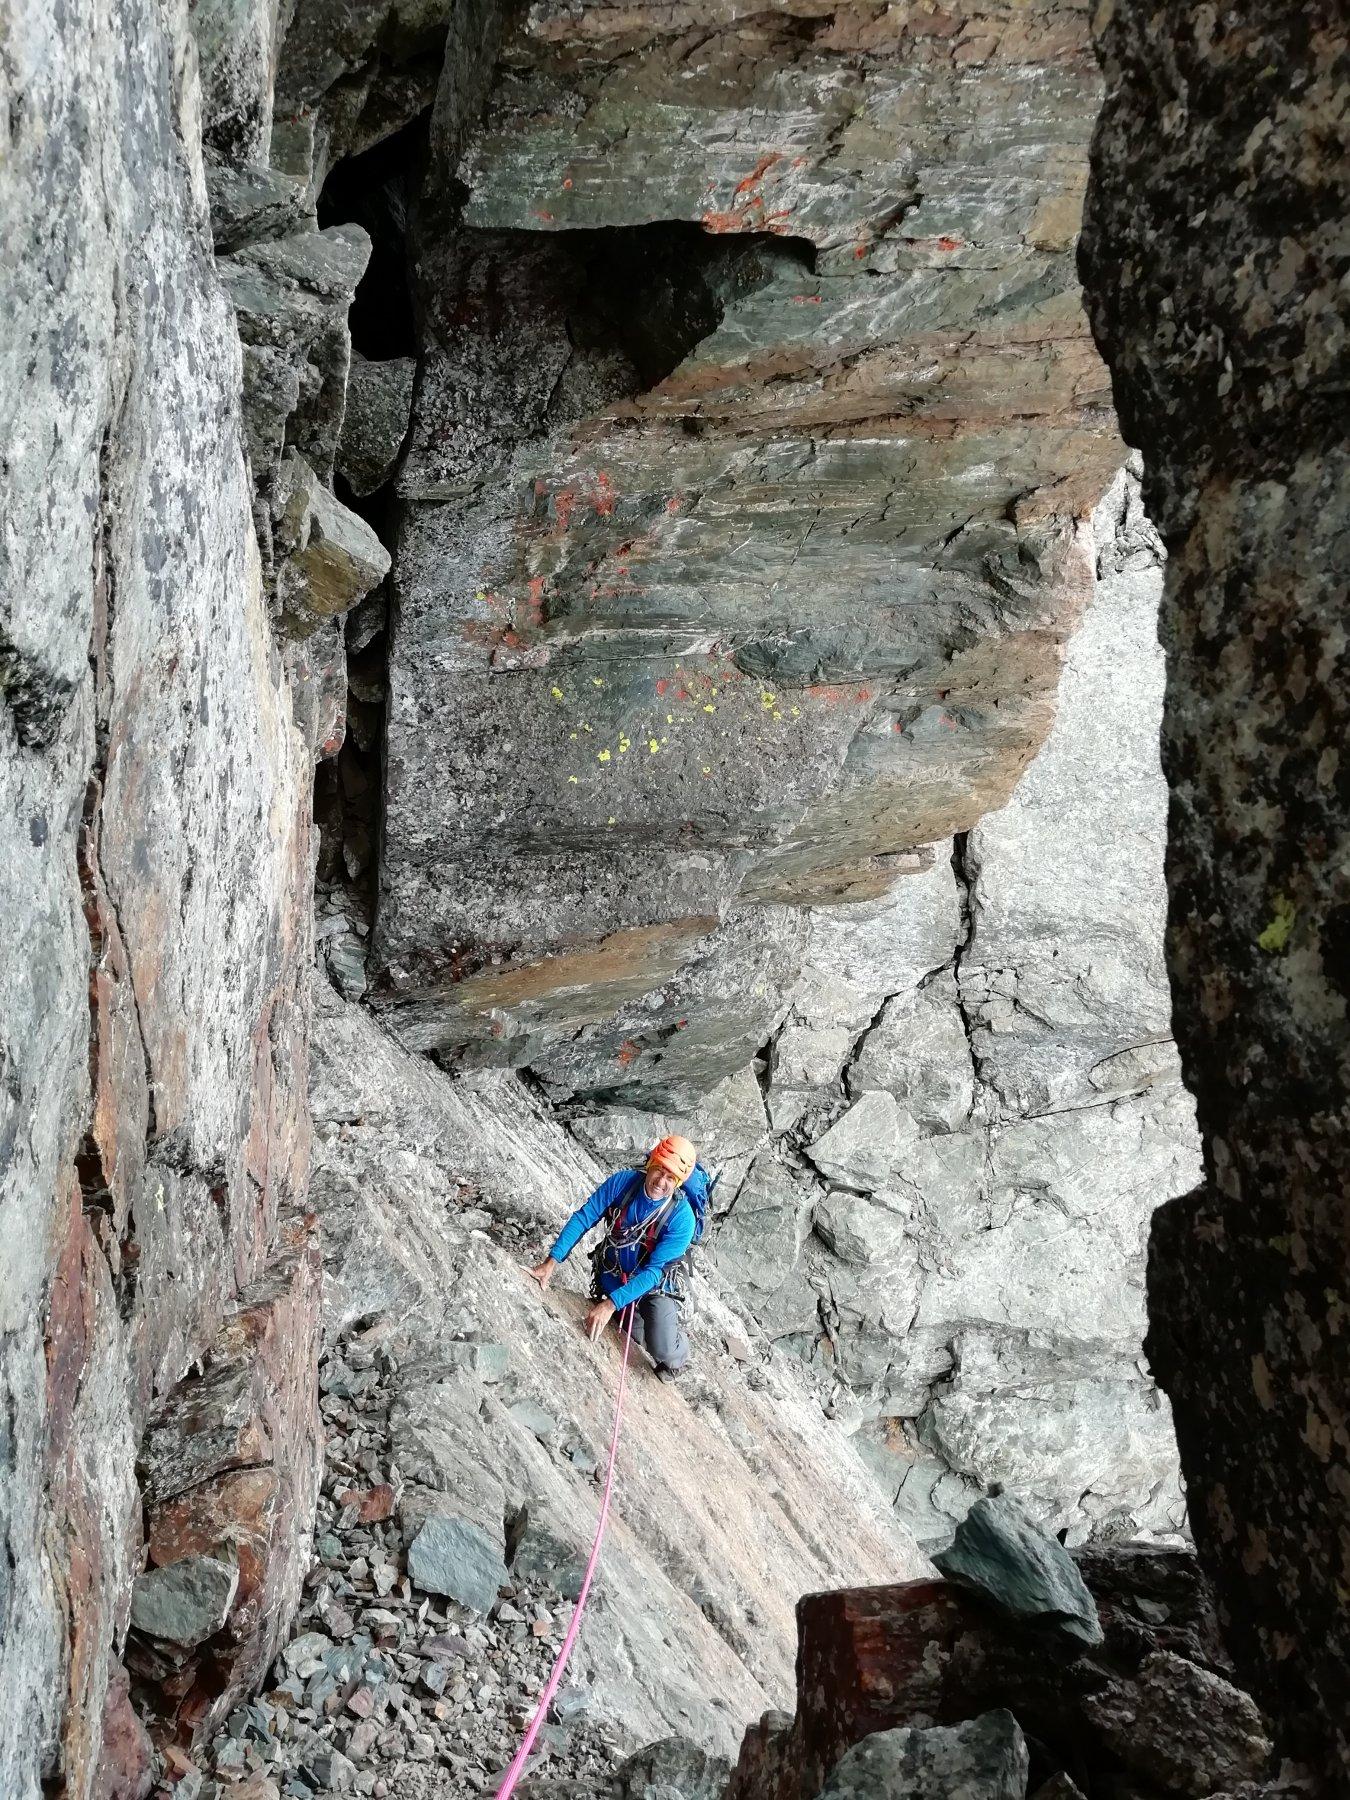 Viso di VallantaCresta Ovest 2019-08-10